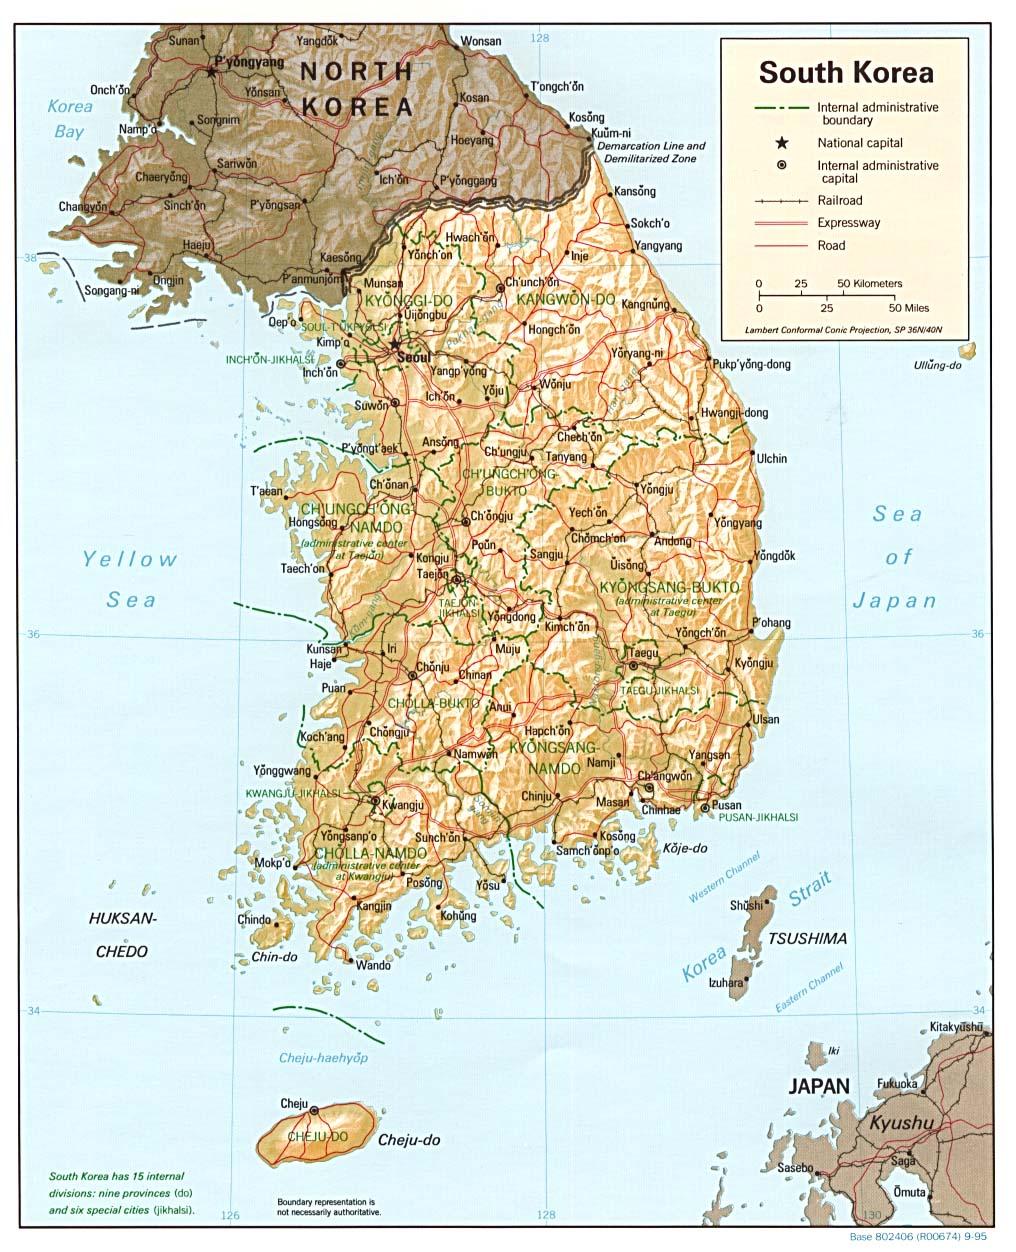 Südkorea Karte.Landkarten Südkorea Reliefkarte Weltkarte Com Karten Und